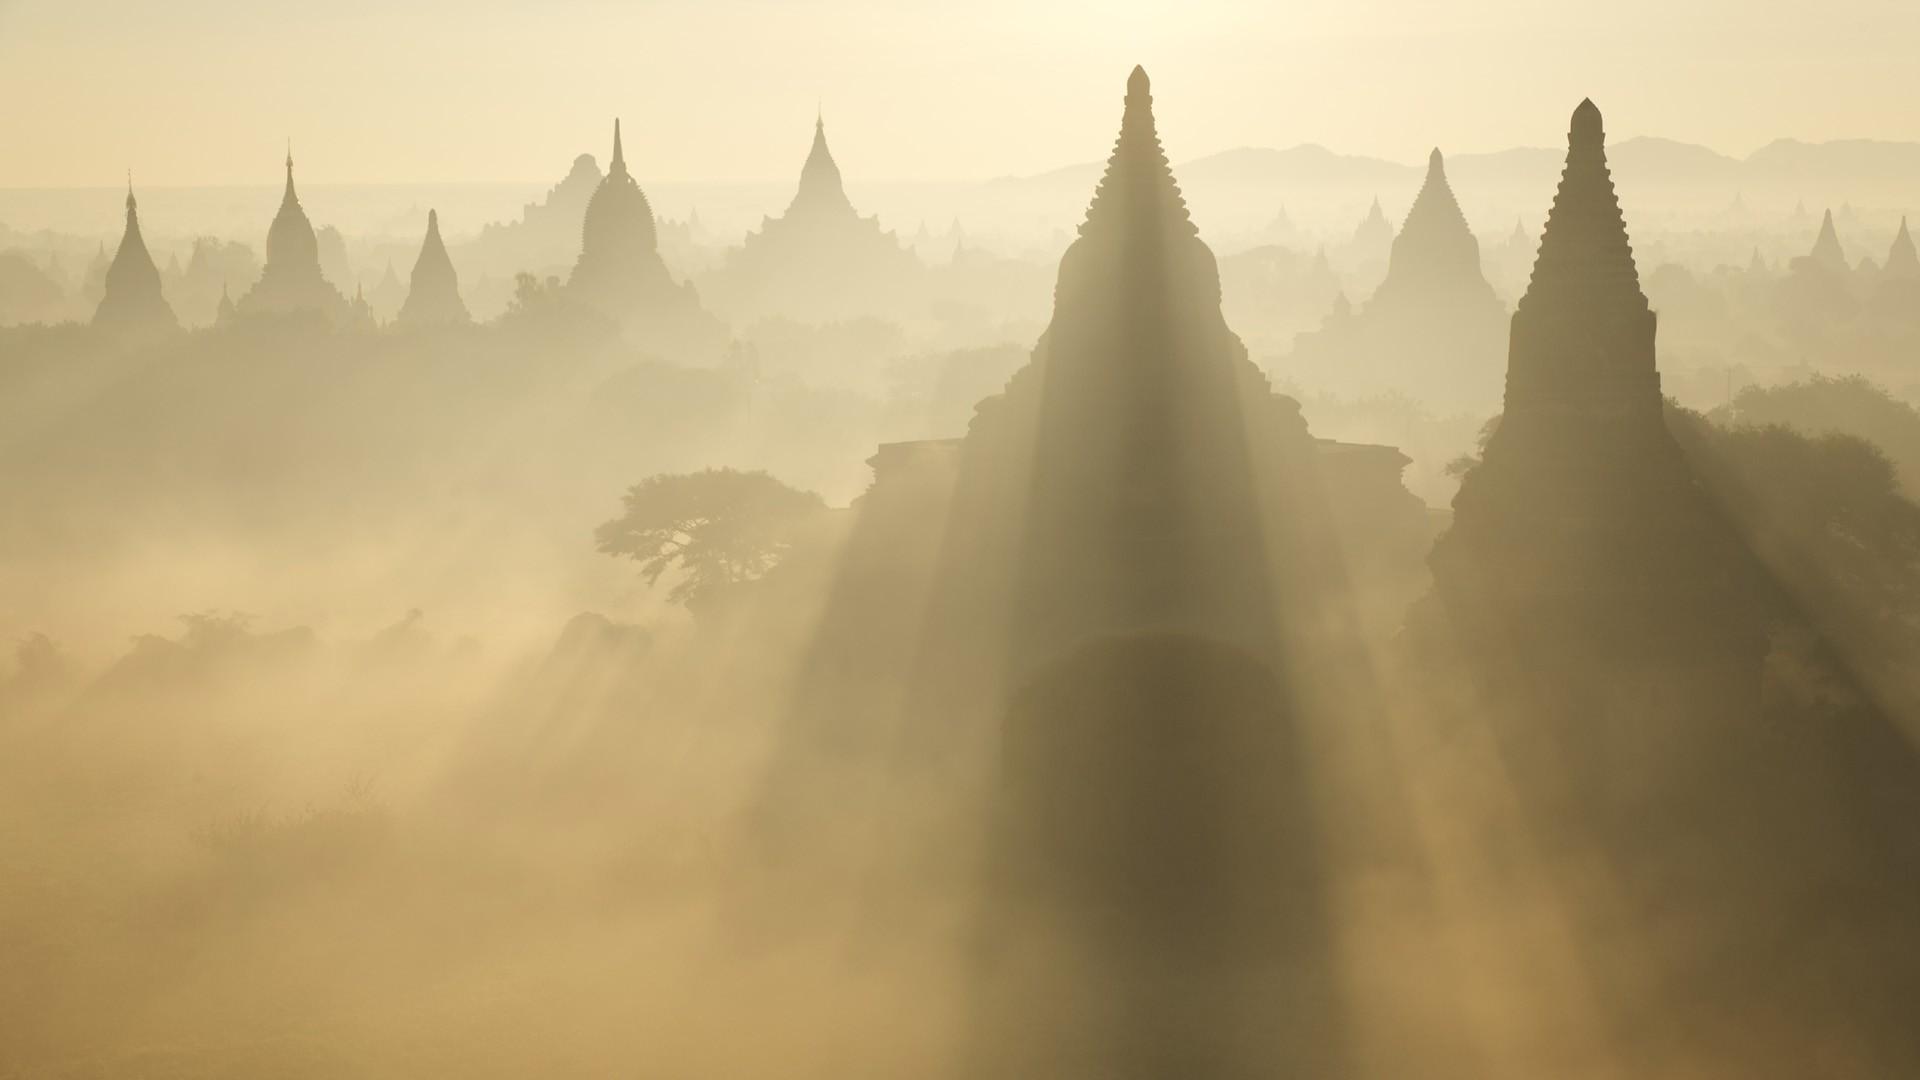 sunrise-ruins-fog-x-wallpaper-wp429450